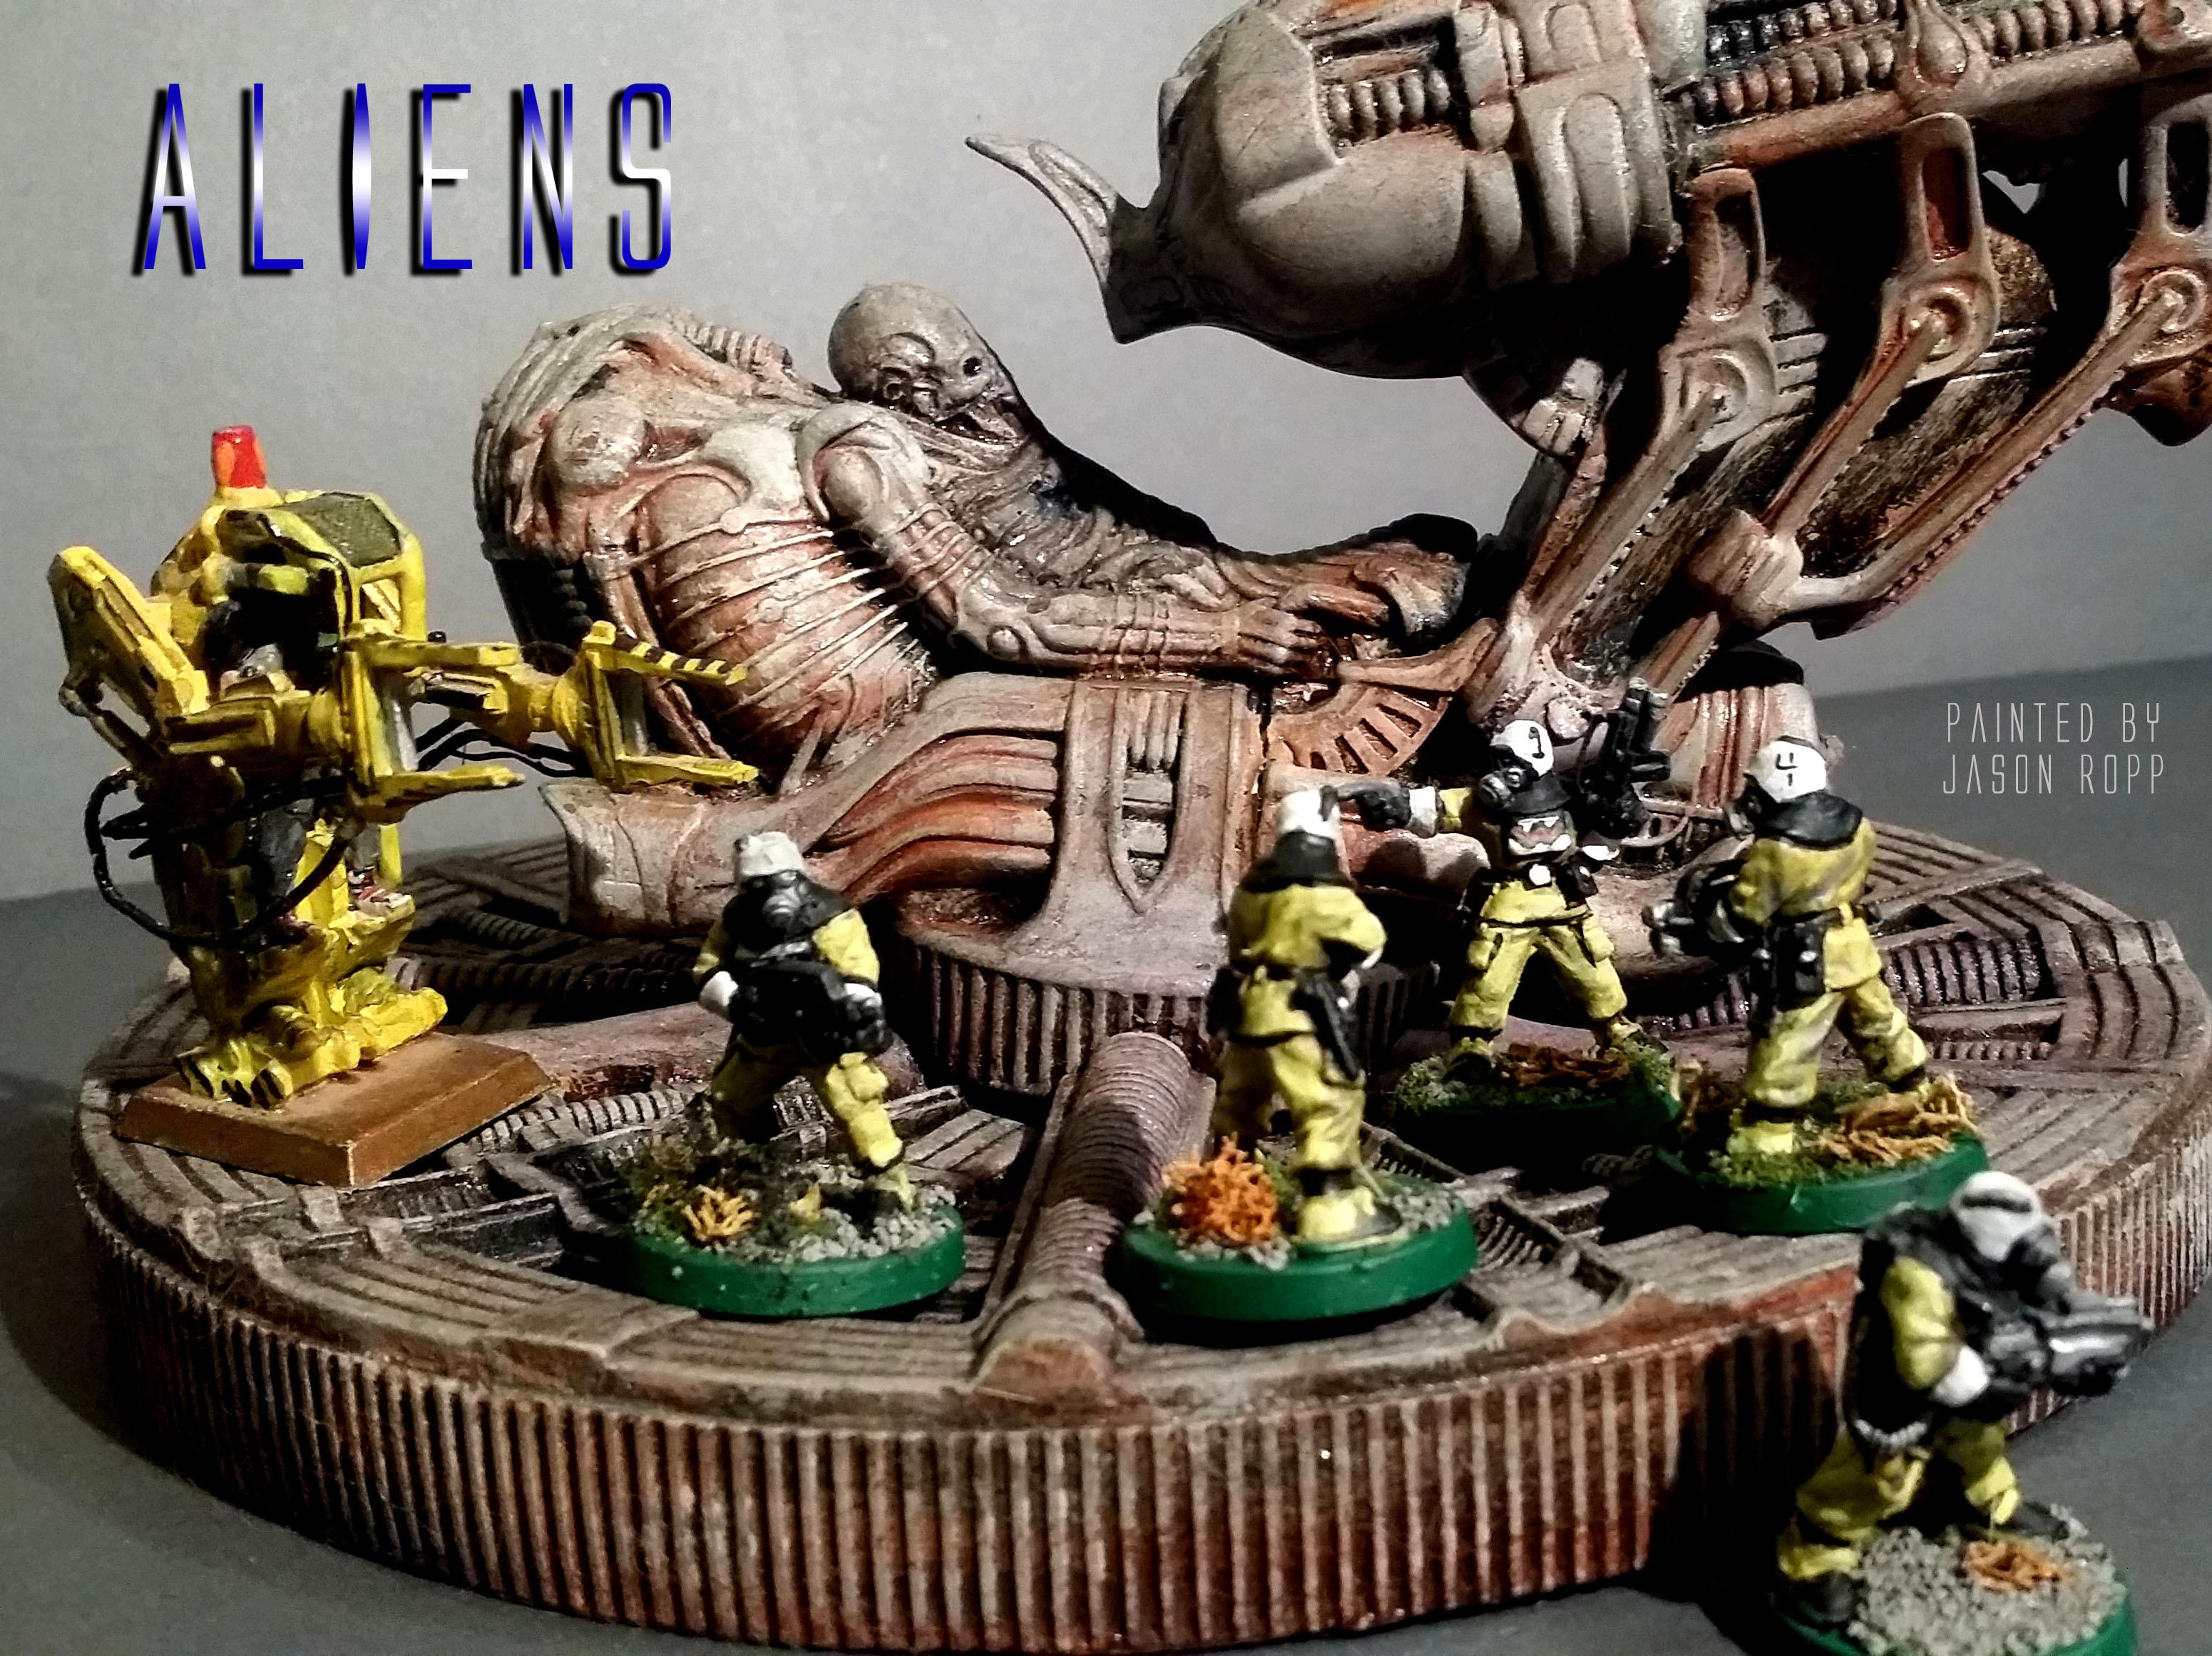 Alien, Aliens, Avp, Colonial Marines, Egg, Facehugger, Hasslefree, Horrorclix, Miniaturem Miniatures, Newt, Pred, Predator, Prodos, Ripley, Space Jocky, Wayland-yutani